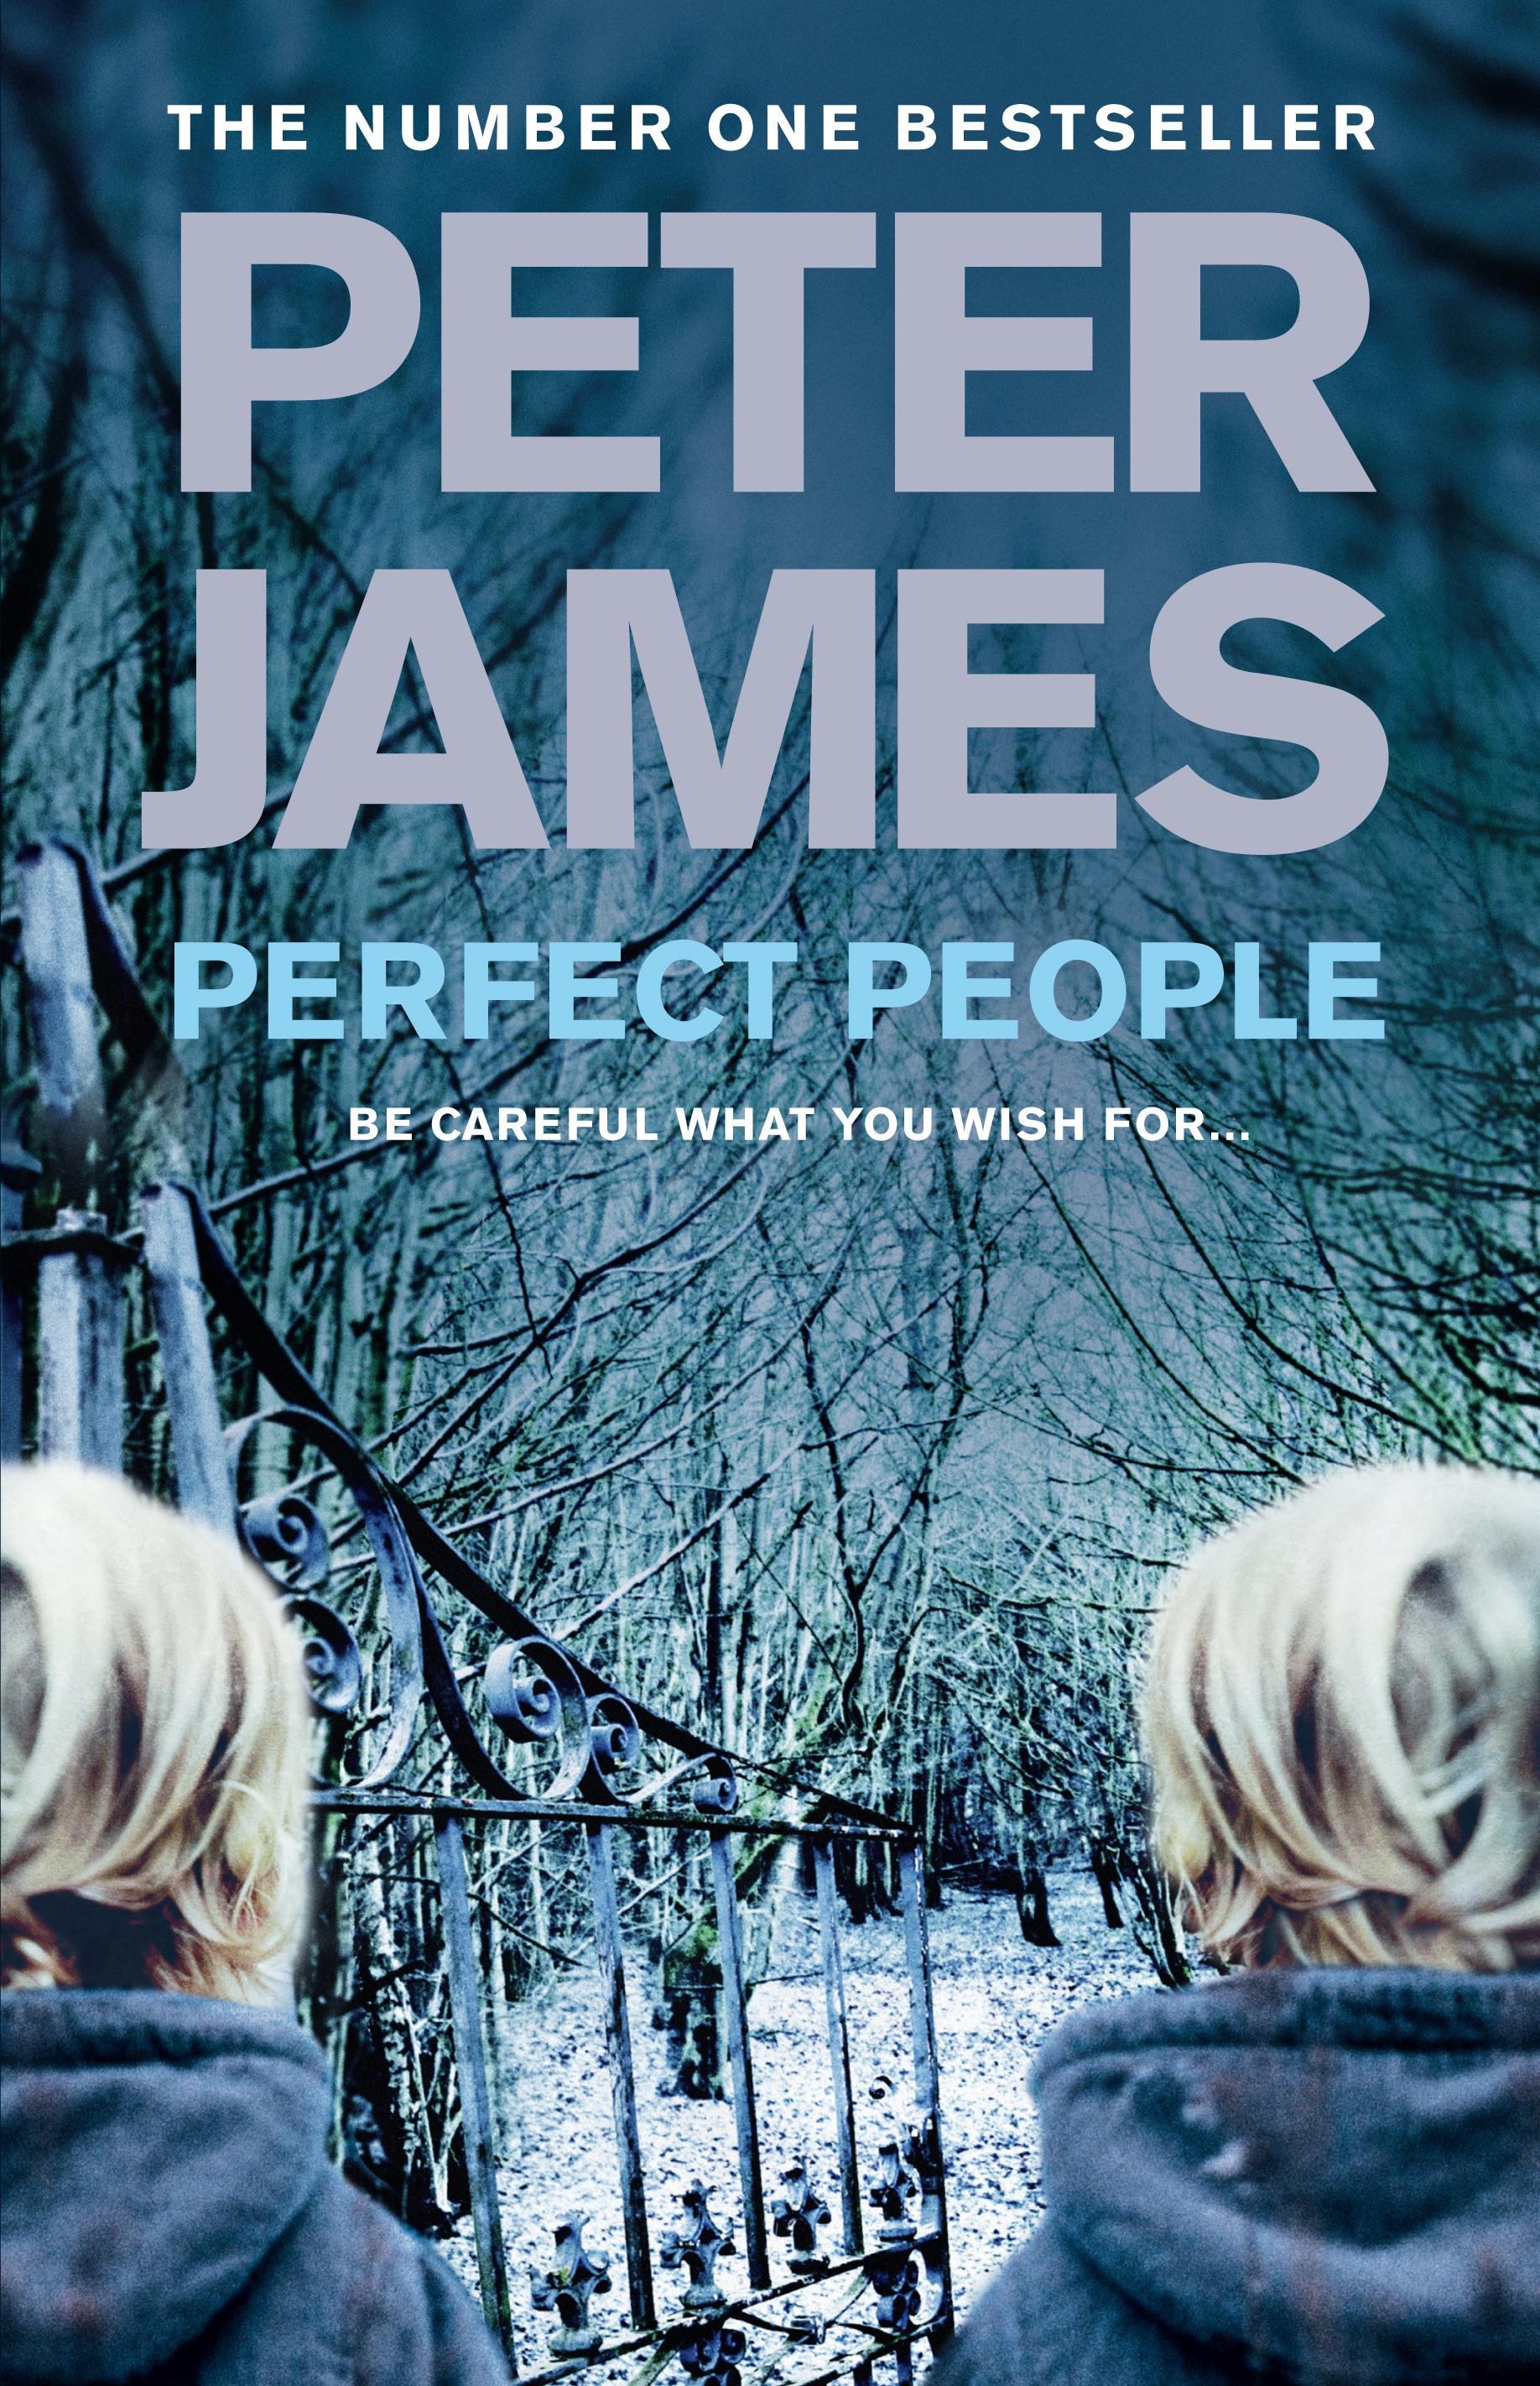 JAMES - PERFECT PEOPLE Macmillan cover.jpg